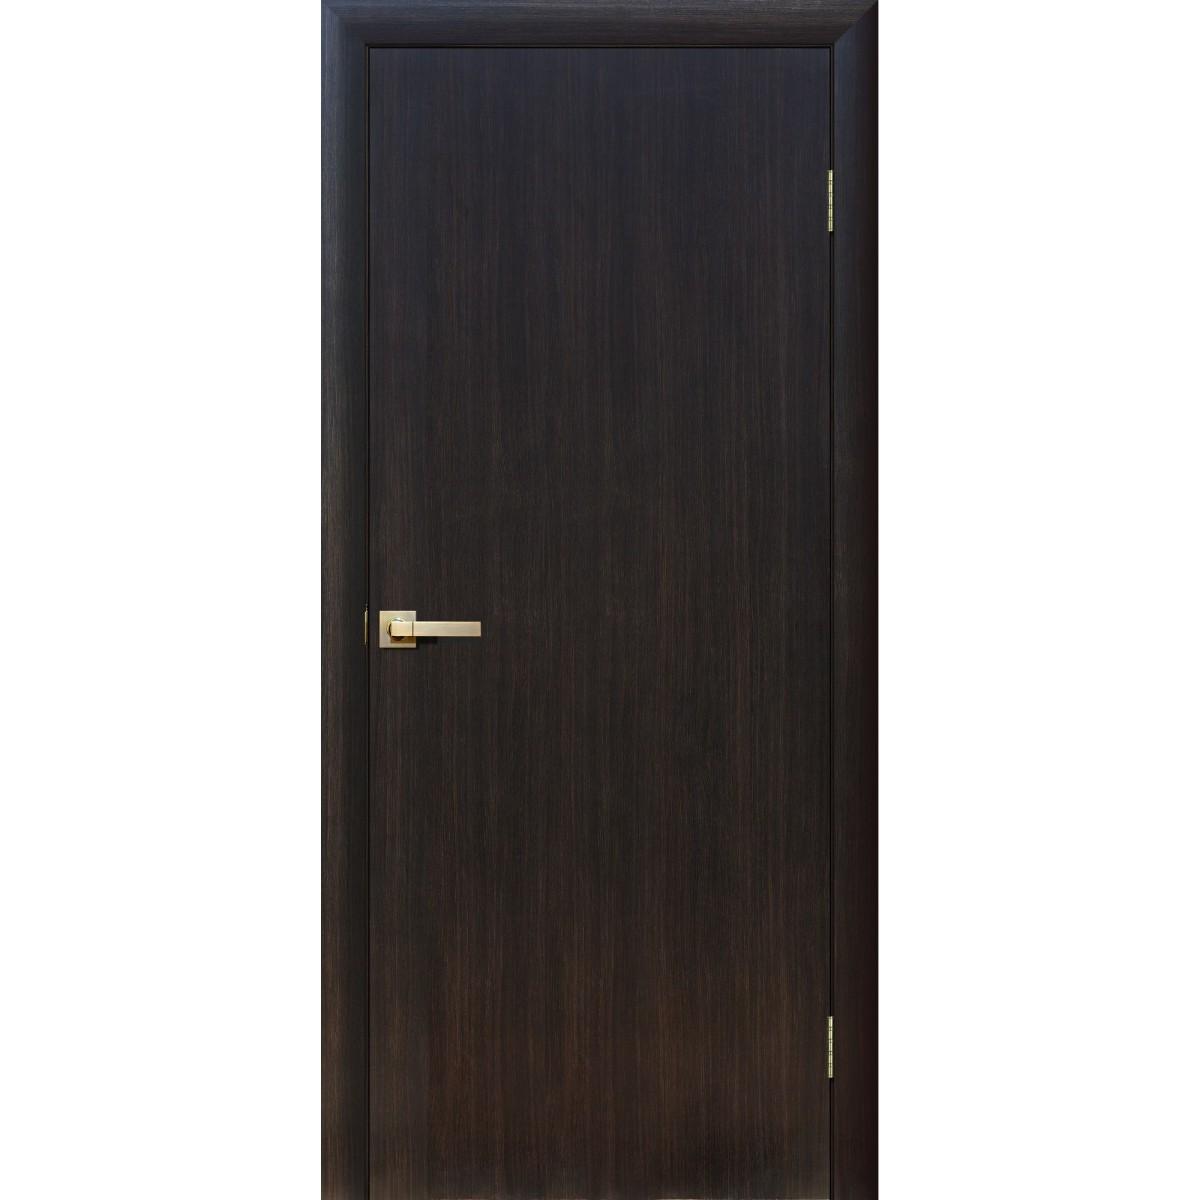 Дверь межкомнатная глухая Стандарт 60x200 см ламинация цвет дуб феррара